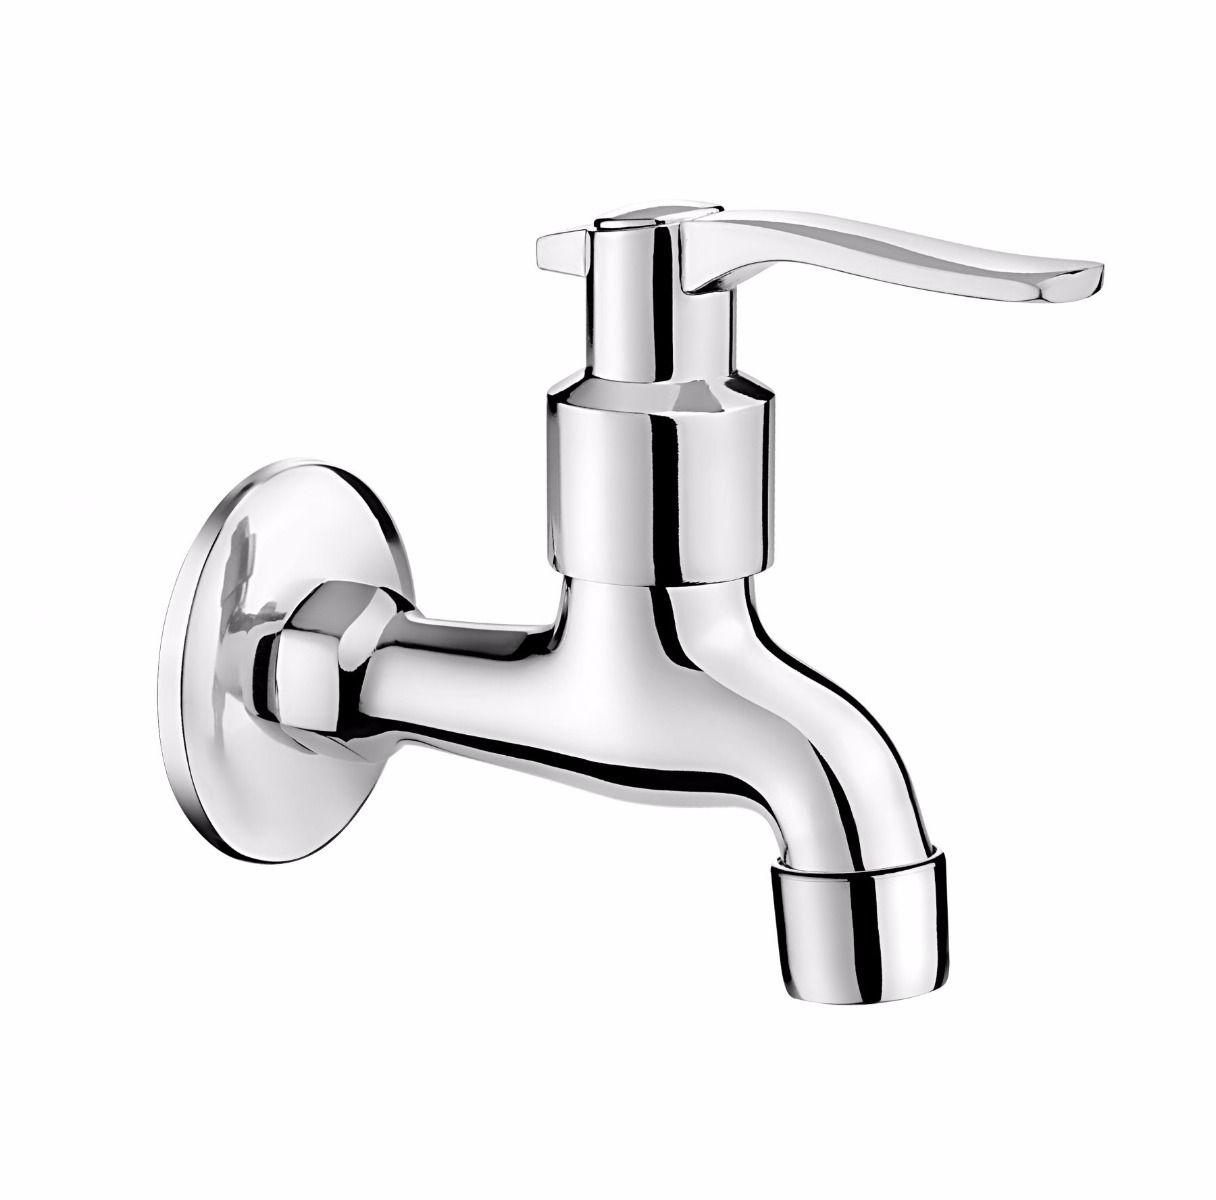 Kitchen Sink Faucets Single Handle Kitchen Faucet Faucet For Kitchen Sink Sink Faucets Kitchen Single Hole Kitche Kitchen Faucet Water Tap Water Valves